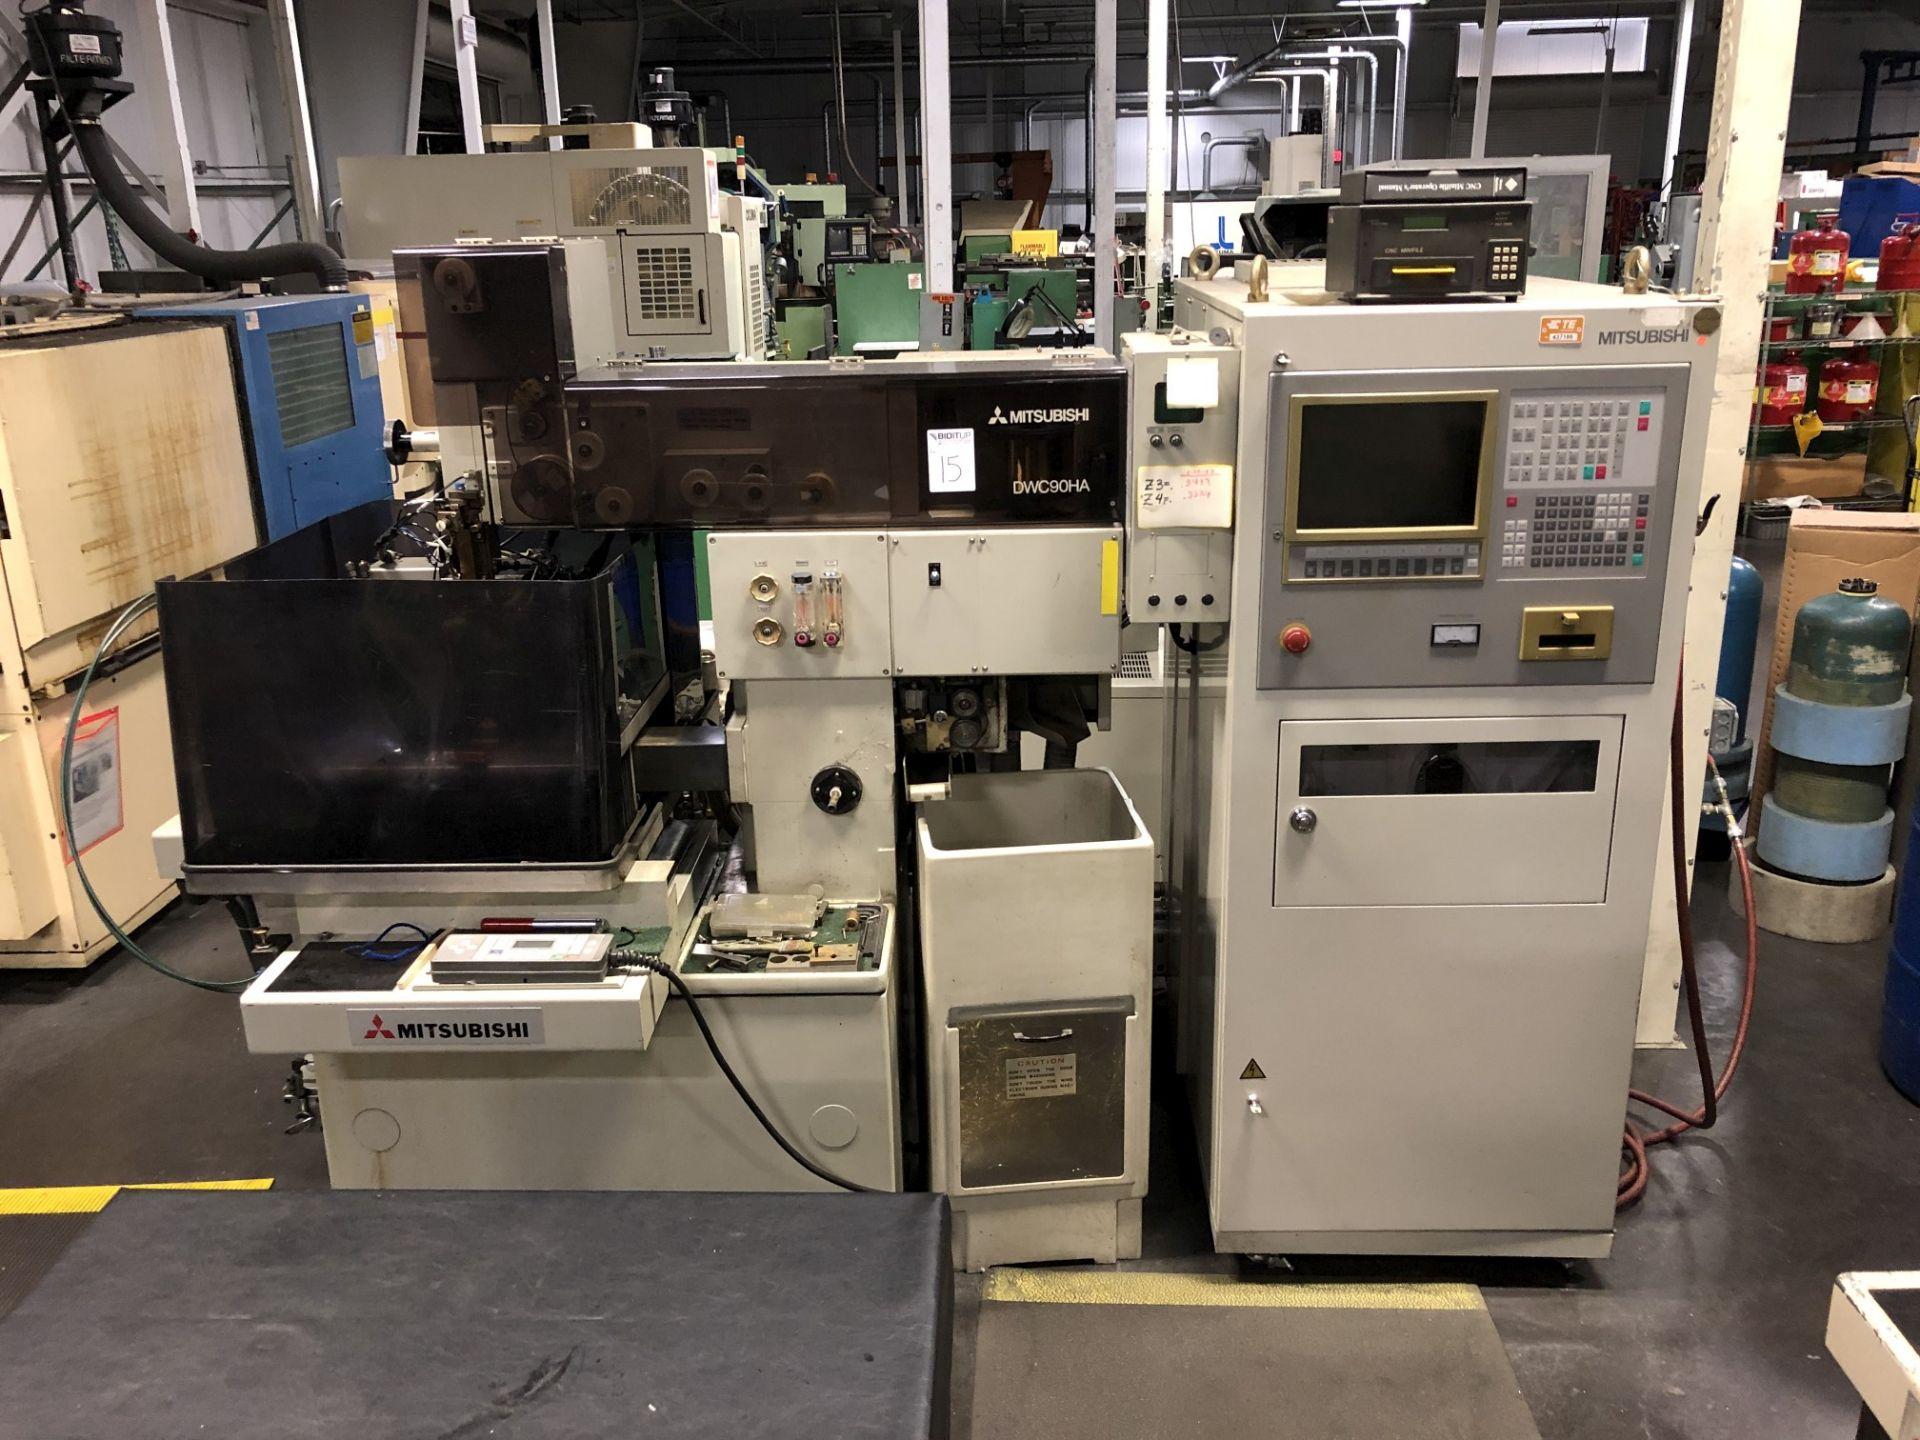 1993 Mitsubishi DWC90HA CNC Wire EDM